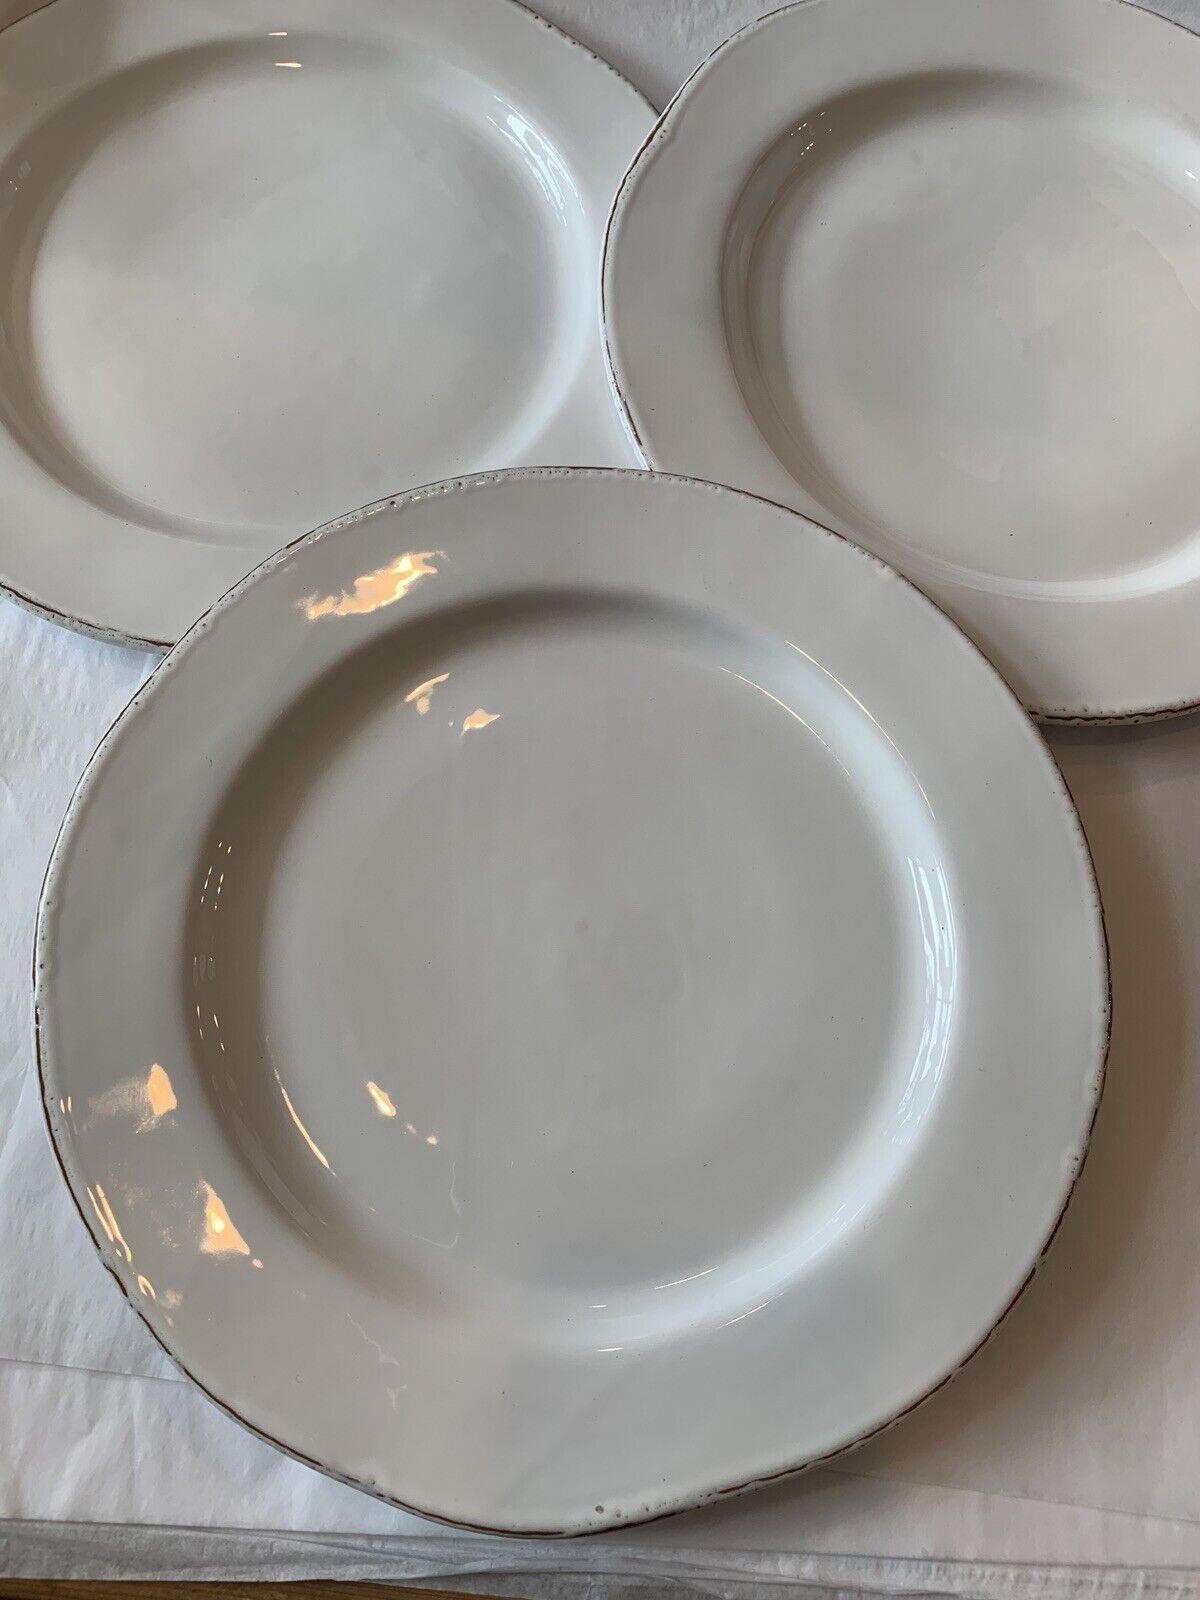 Vietri Bianco OverTaille Dinner Plate Set de 3 NEUF